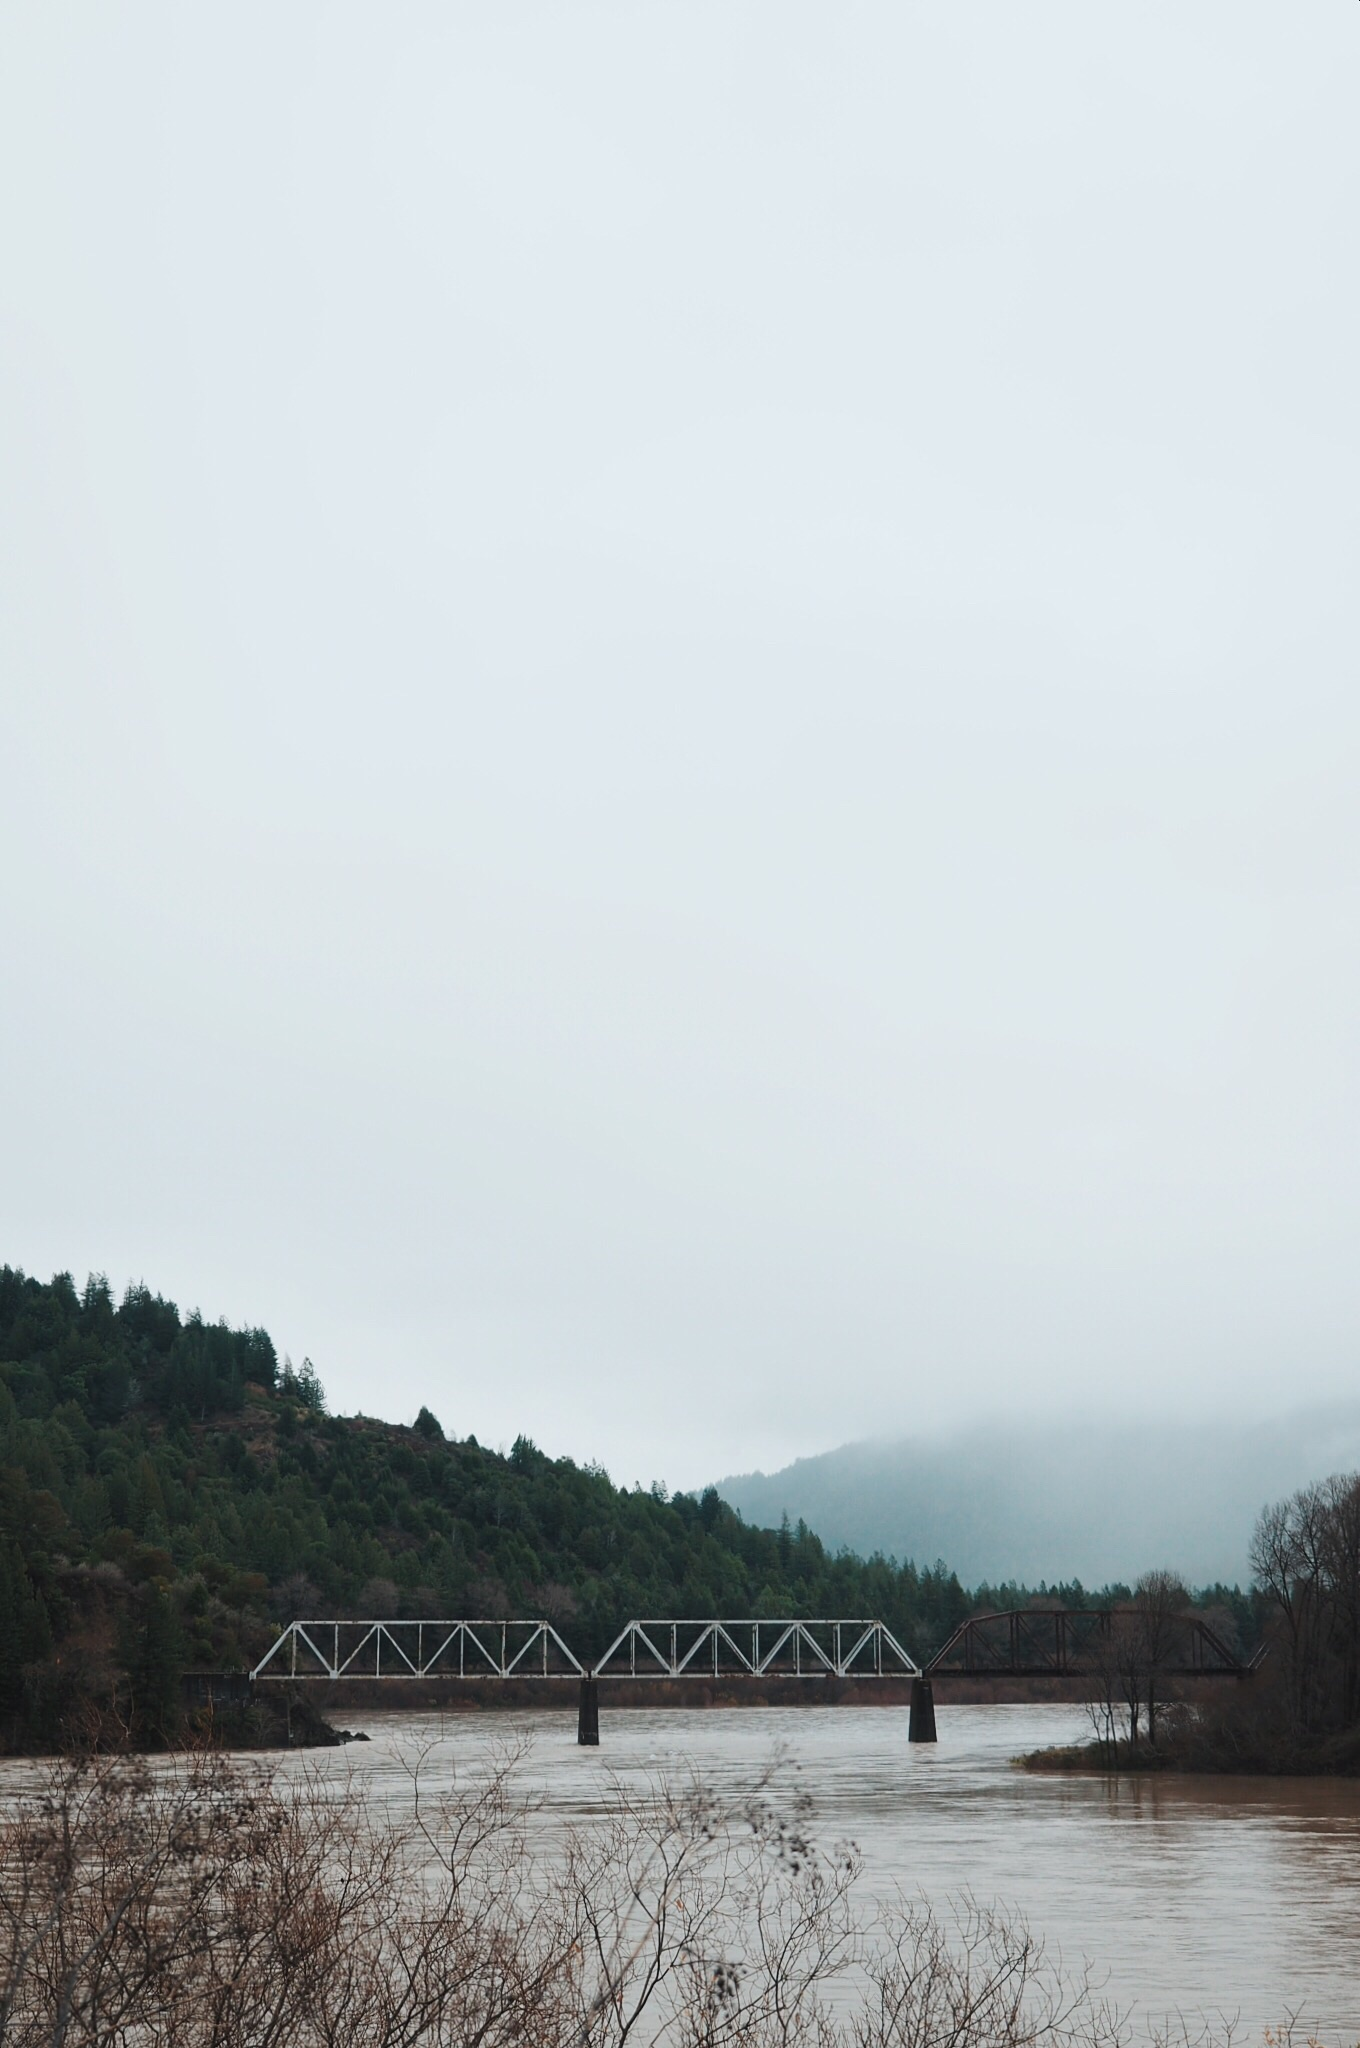 Train trestle over the Eel River